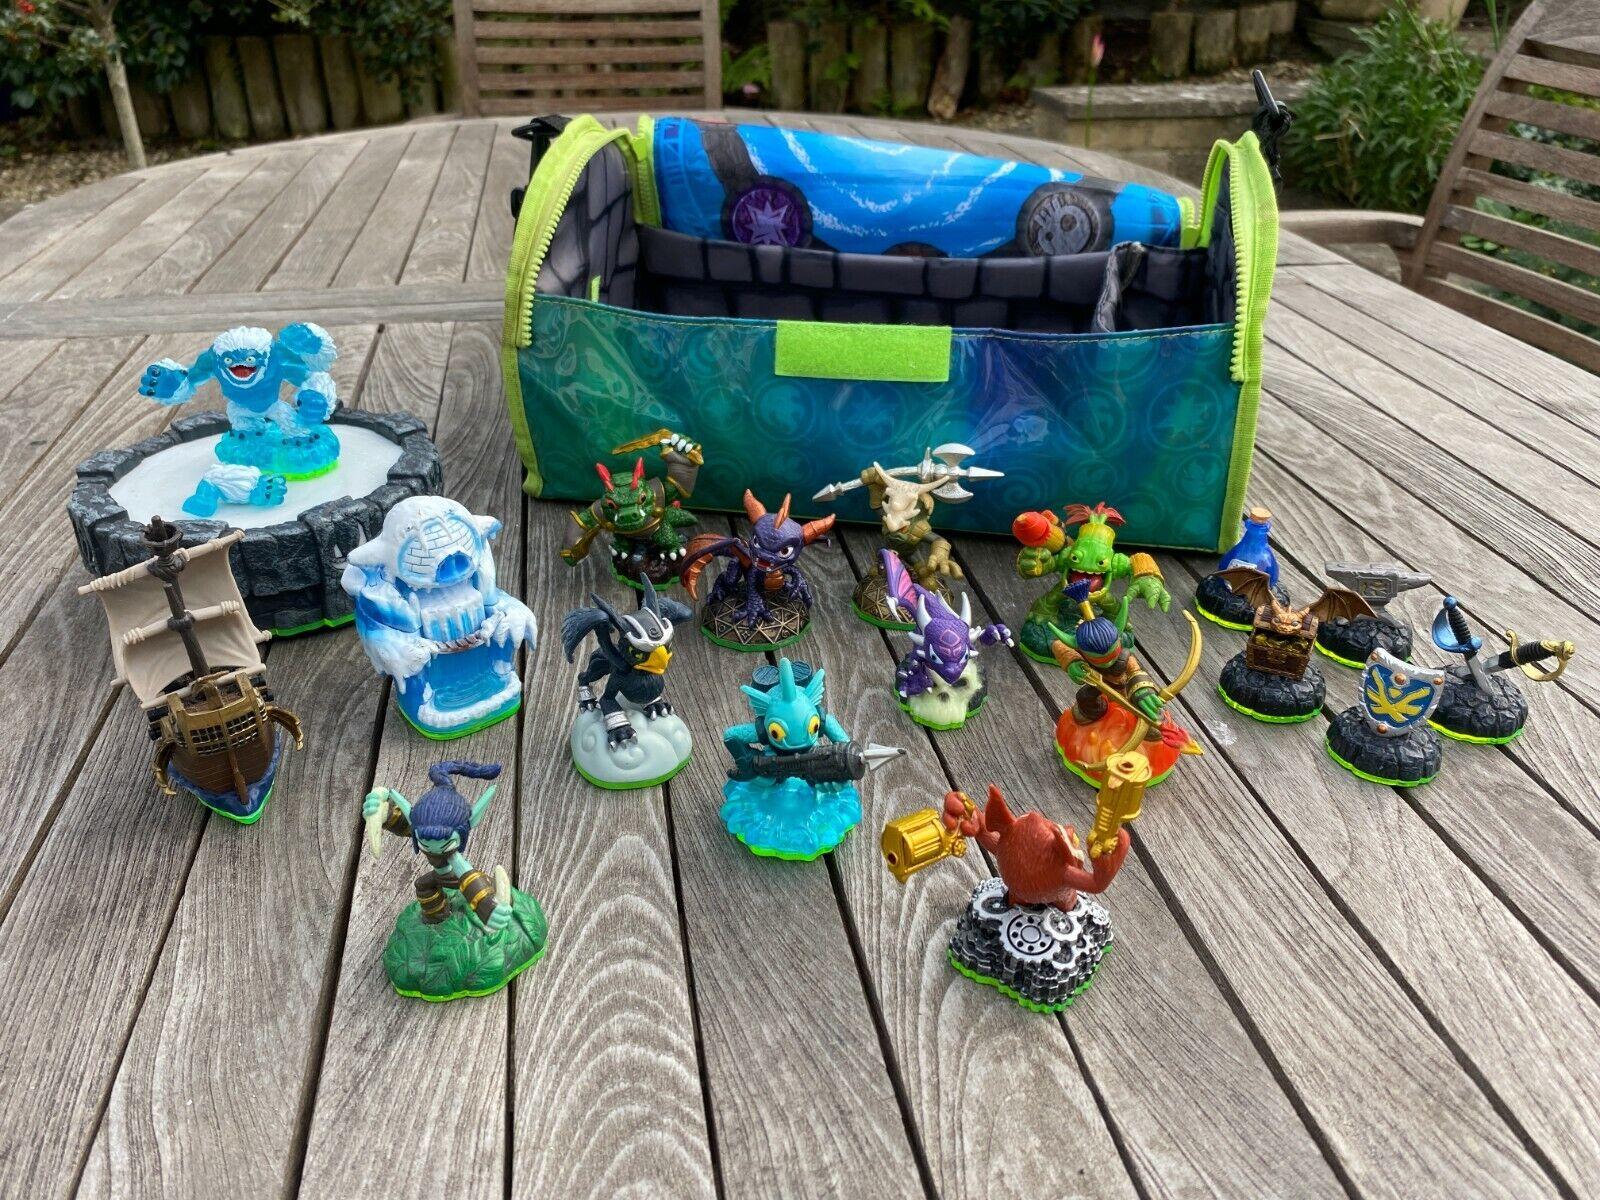 Skylanders Spyro's Adventures Strap Bag w/ 18 Figures Toy Bundle